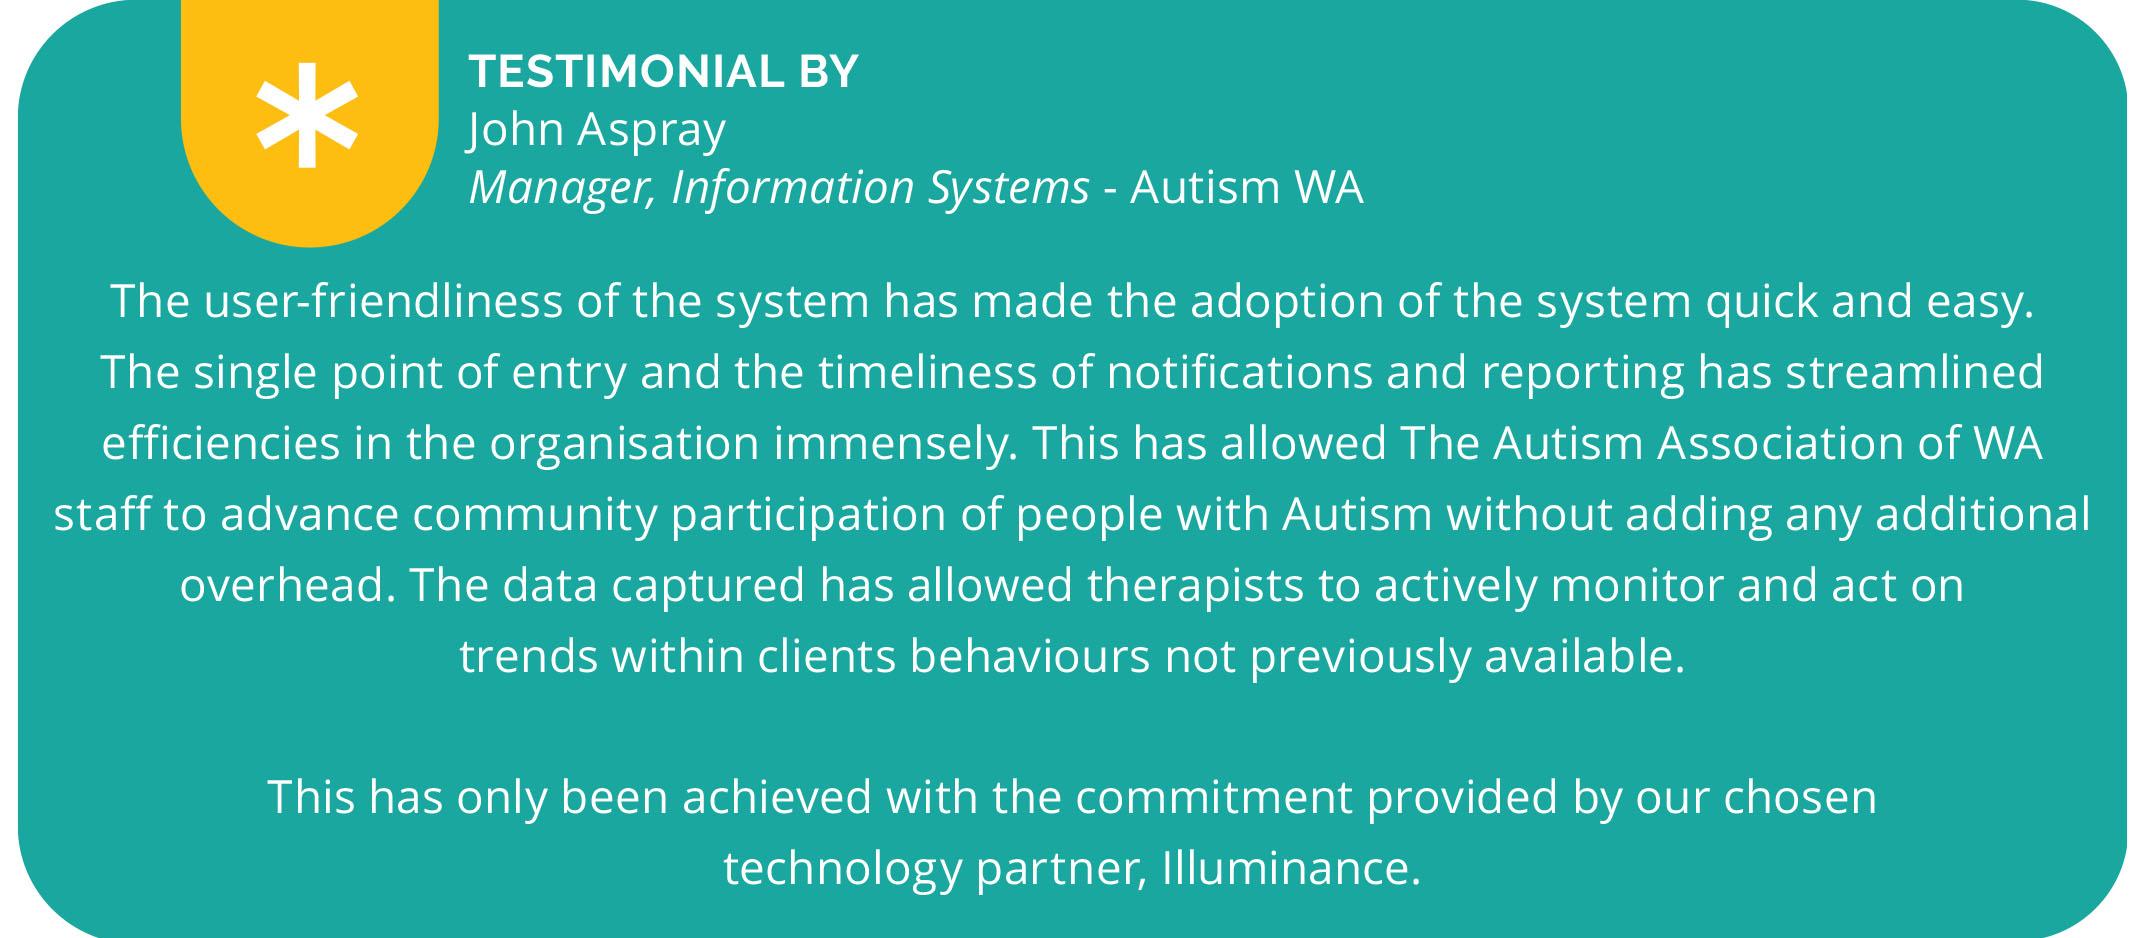 testimonial Autism_WA_AC_Case_Study_v2-2.jpg